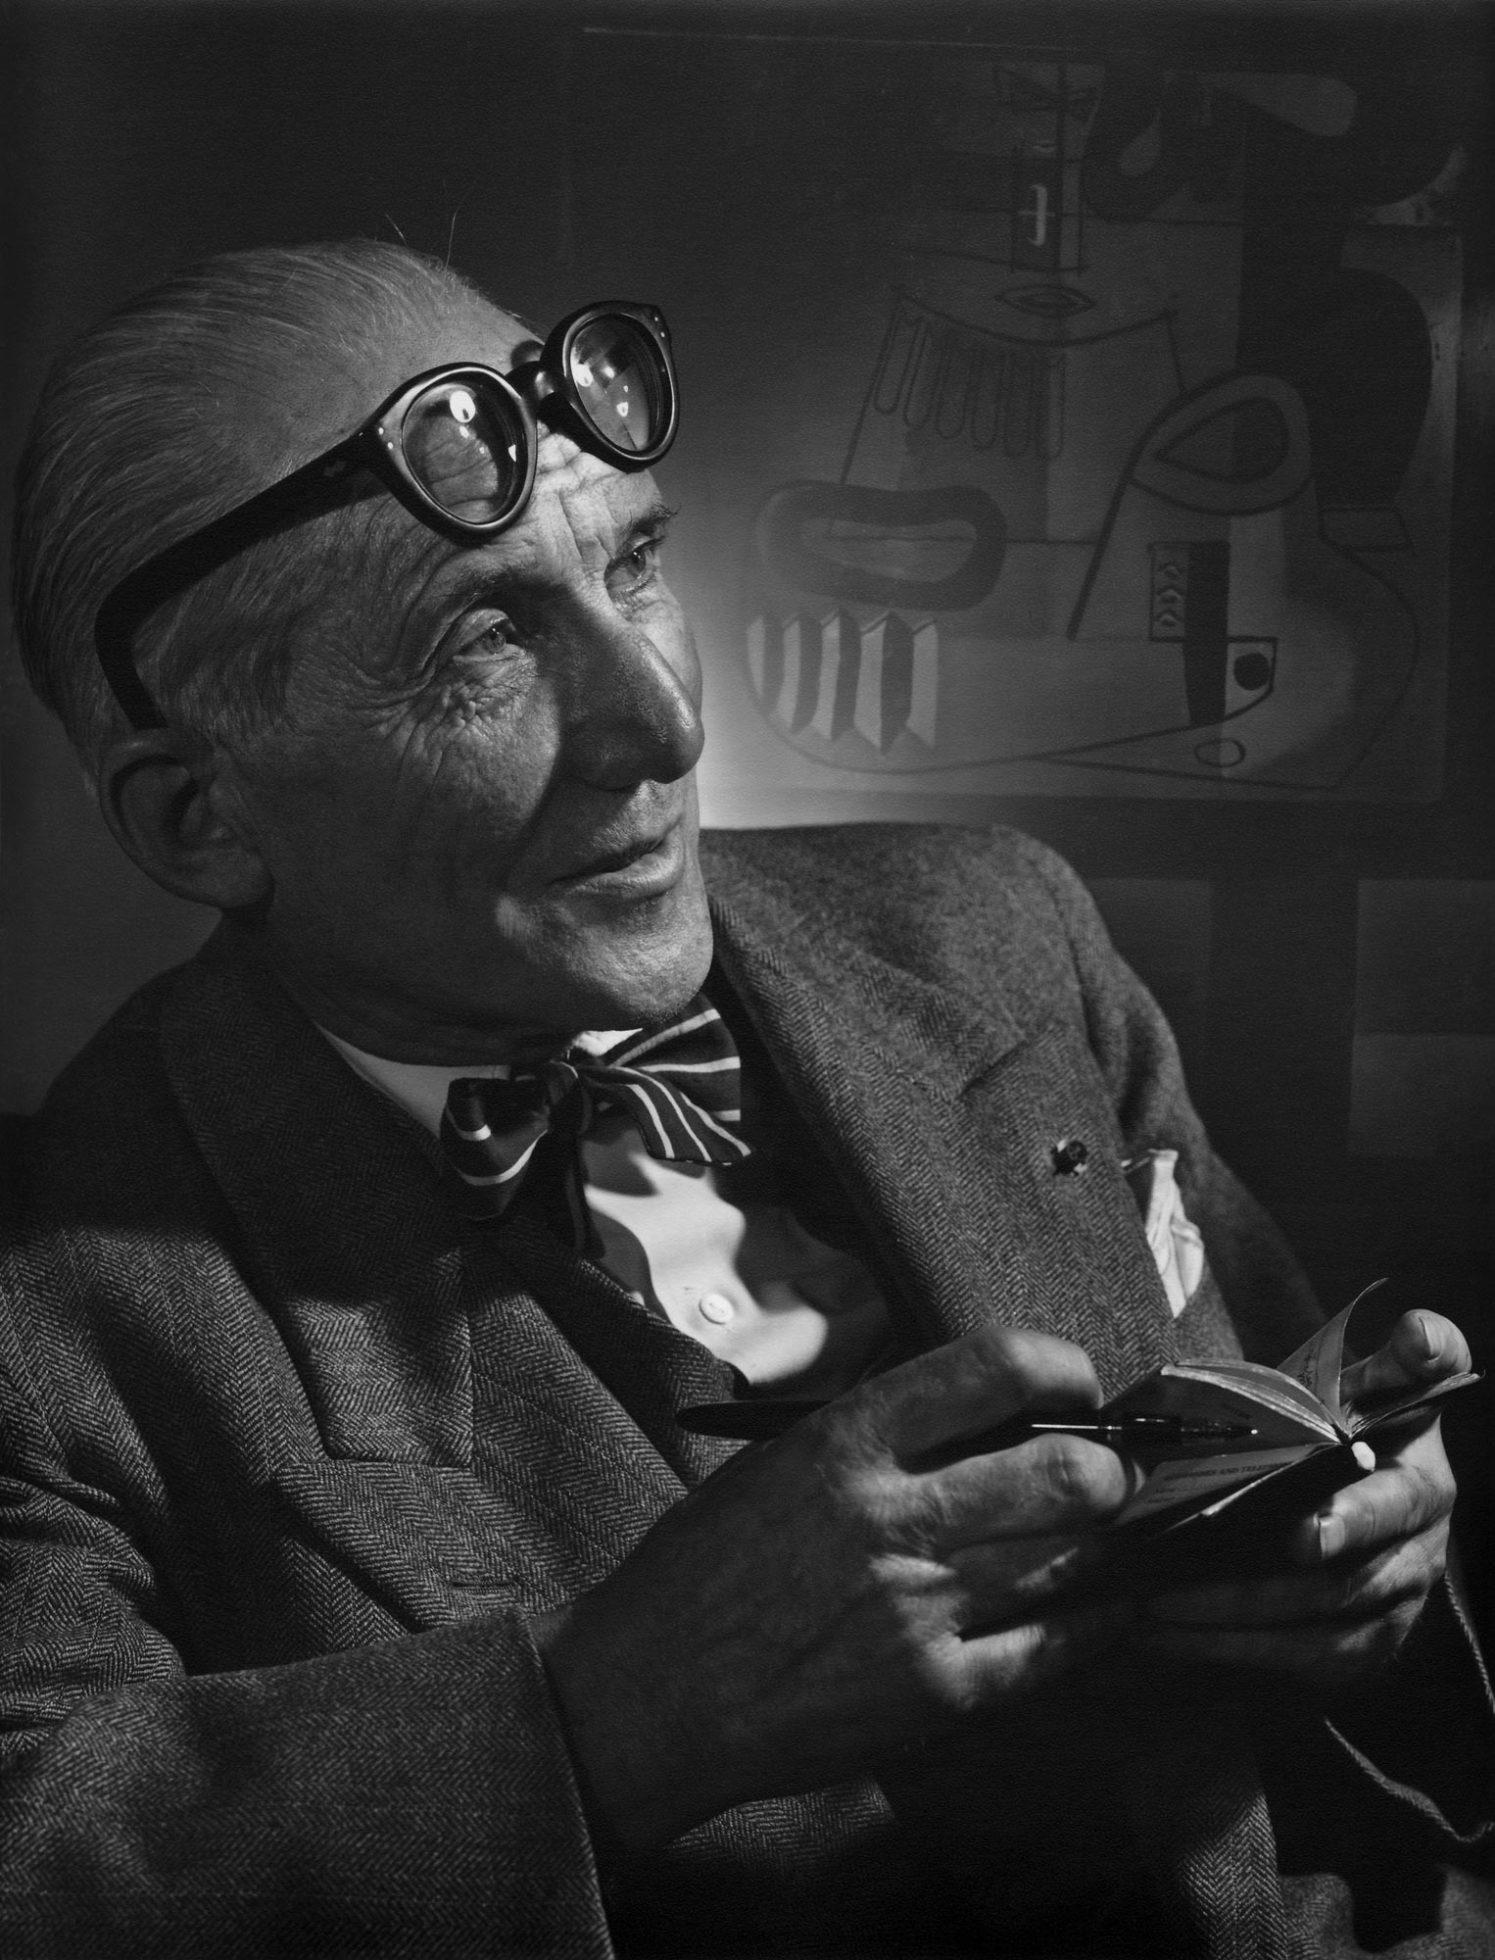 Fotó: Yousuf Karsh: Le Corbusier, 1954 © Yousuf Karsh